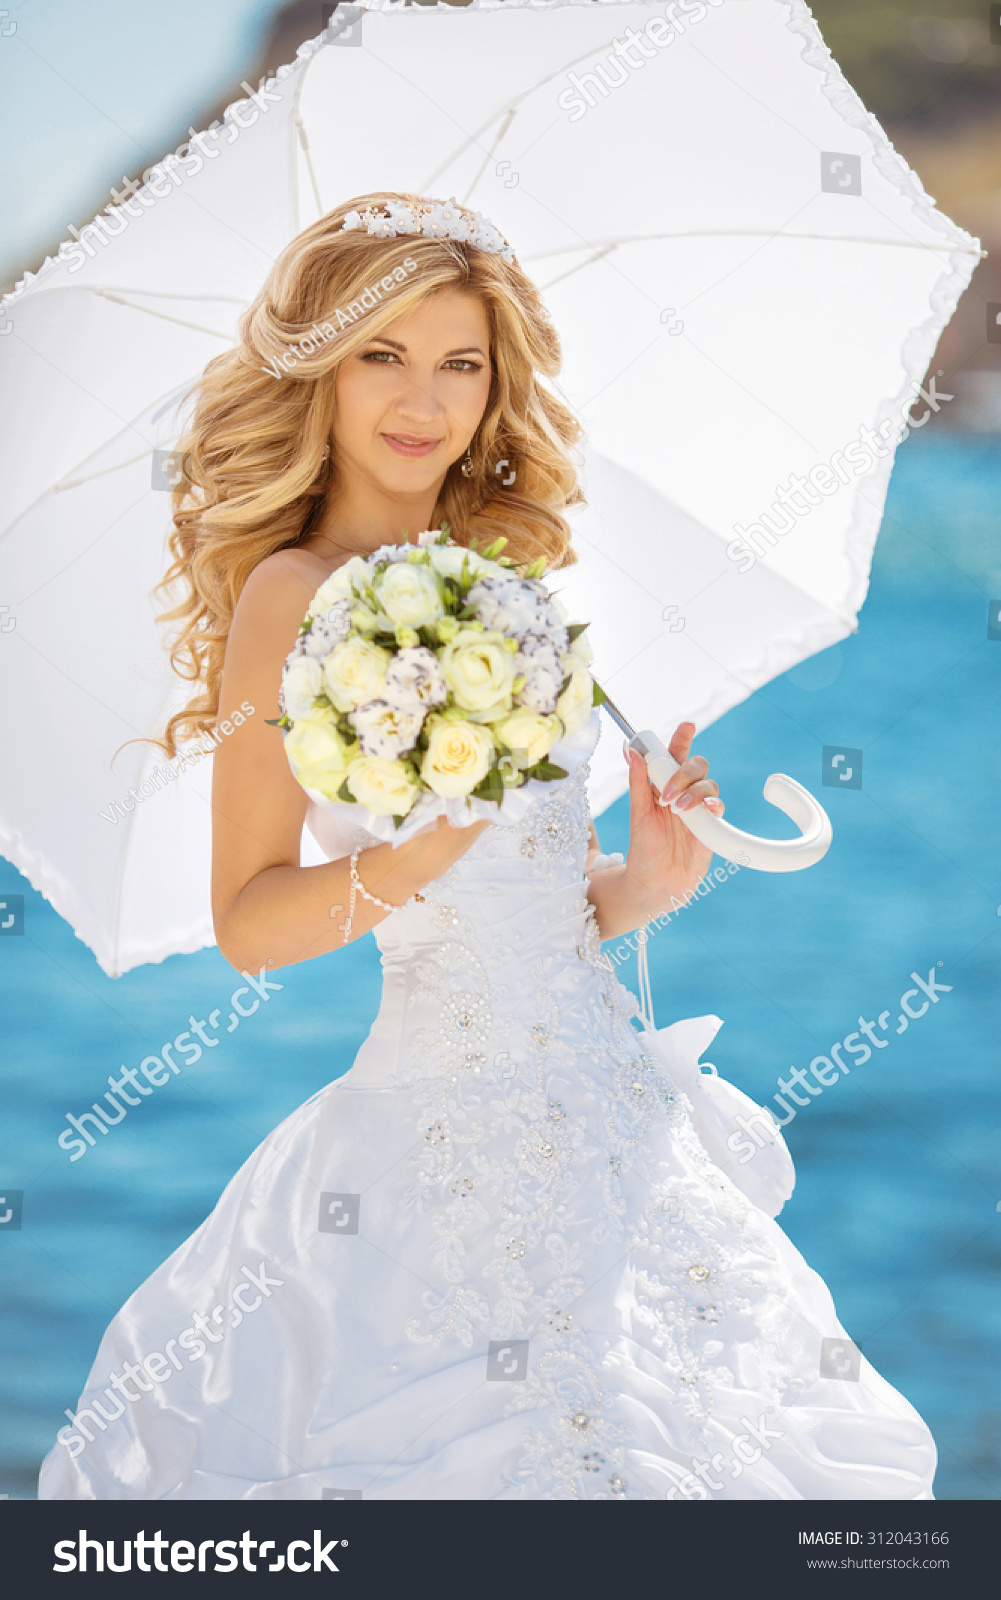 Beautiful Bride Girl Wedding Dress White Stock Photo (Edit Now ...